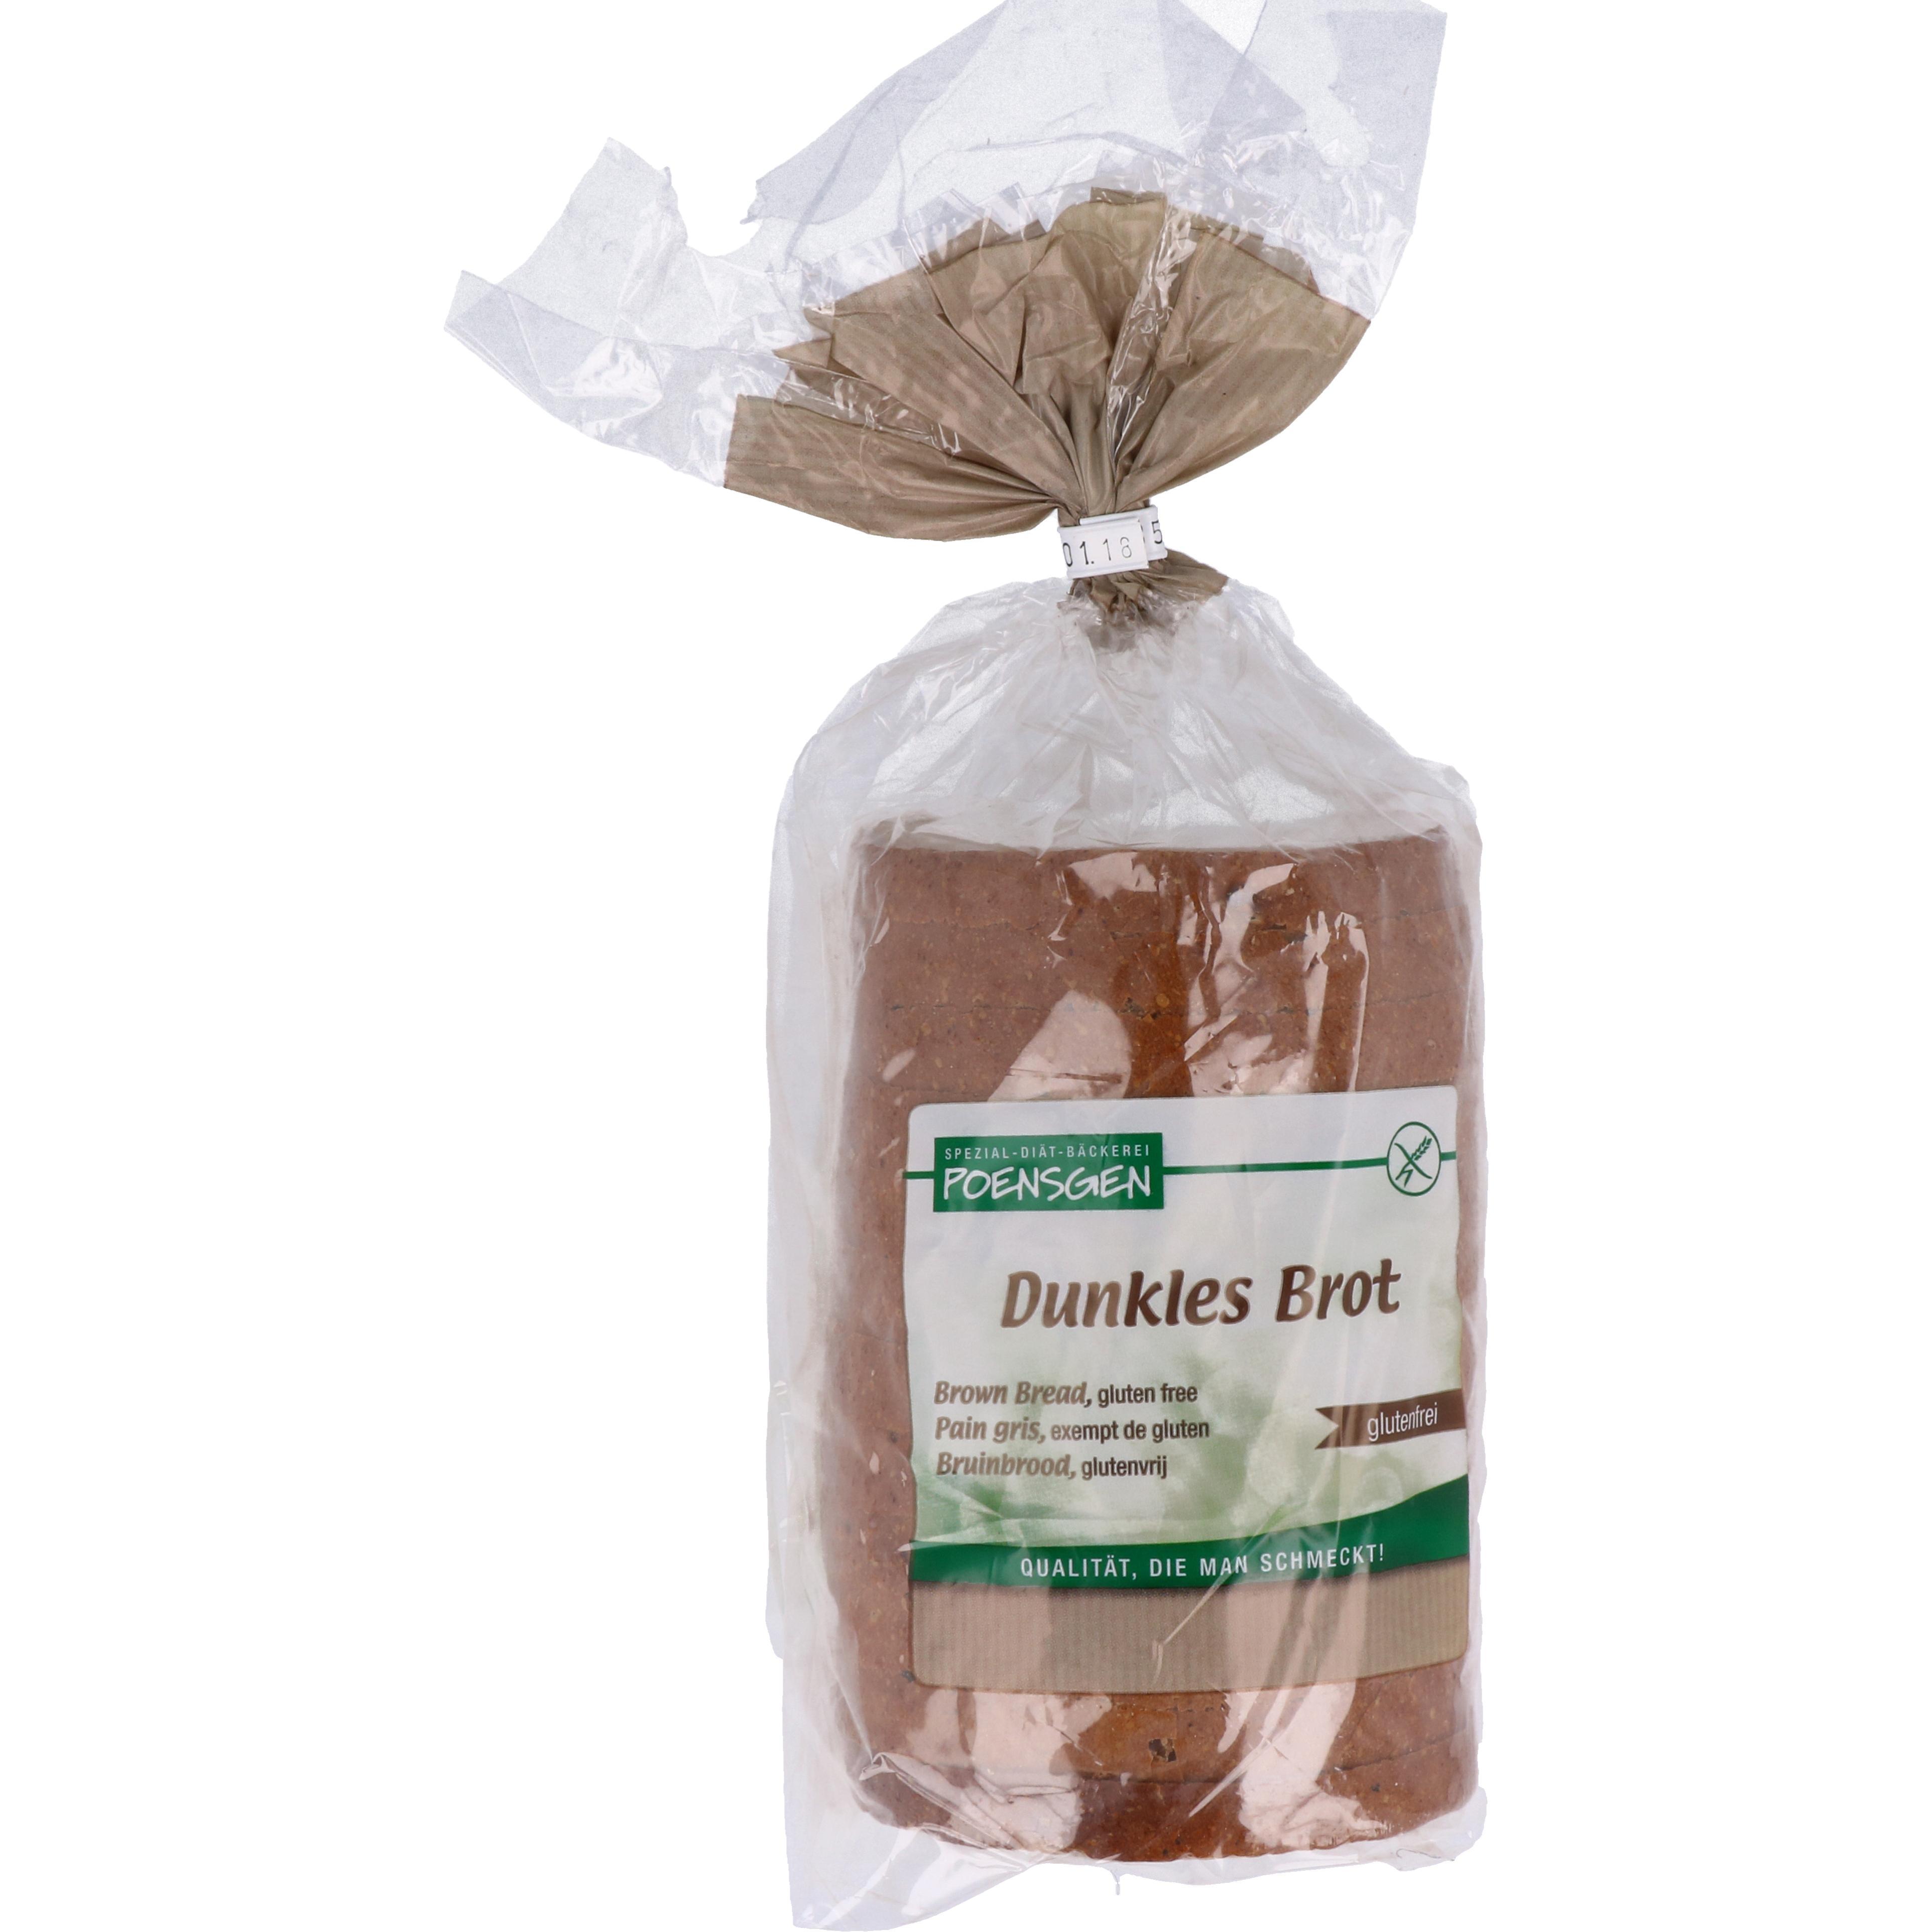 Poensgen Dunkles Brot geschnitten 500g